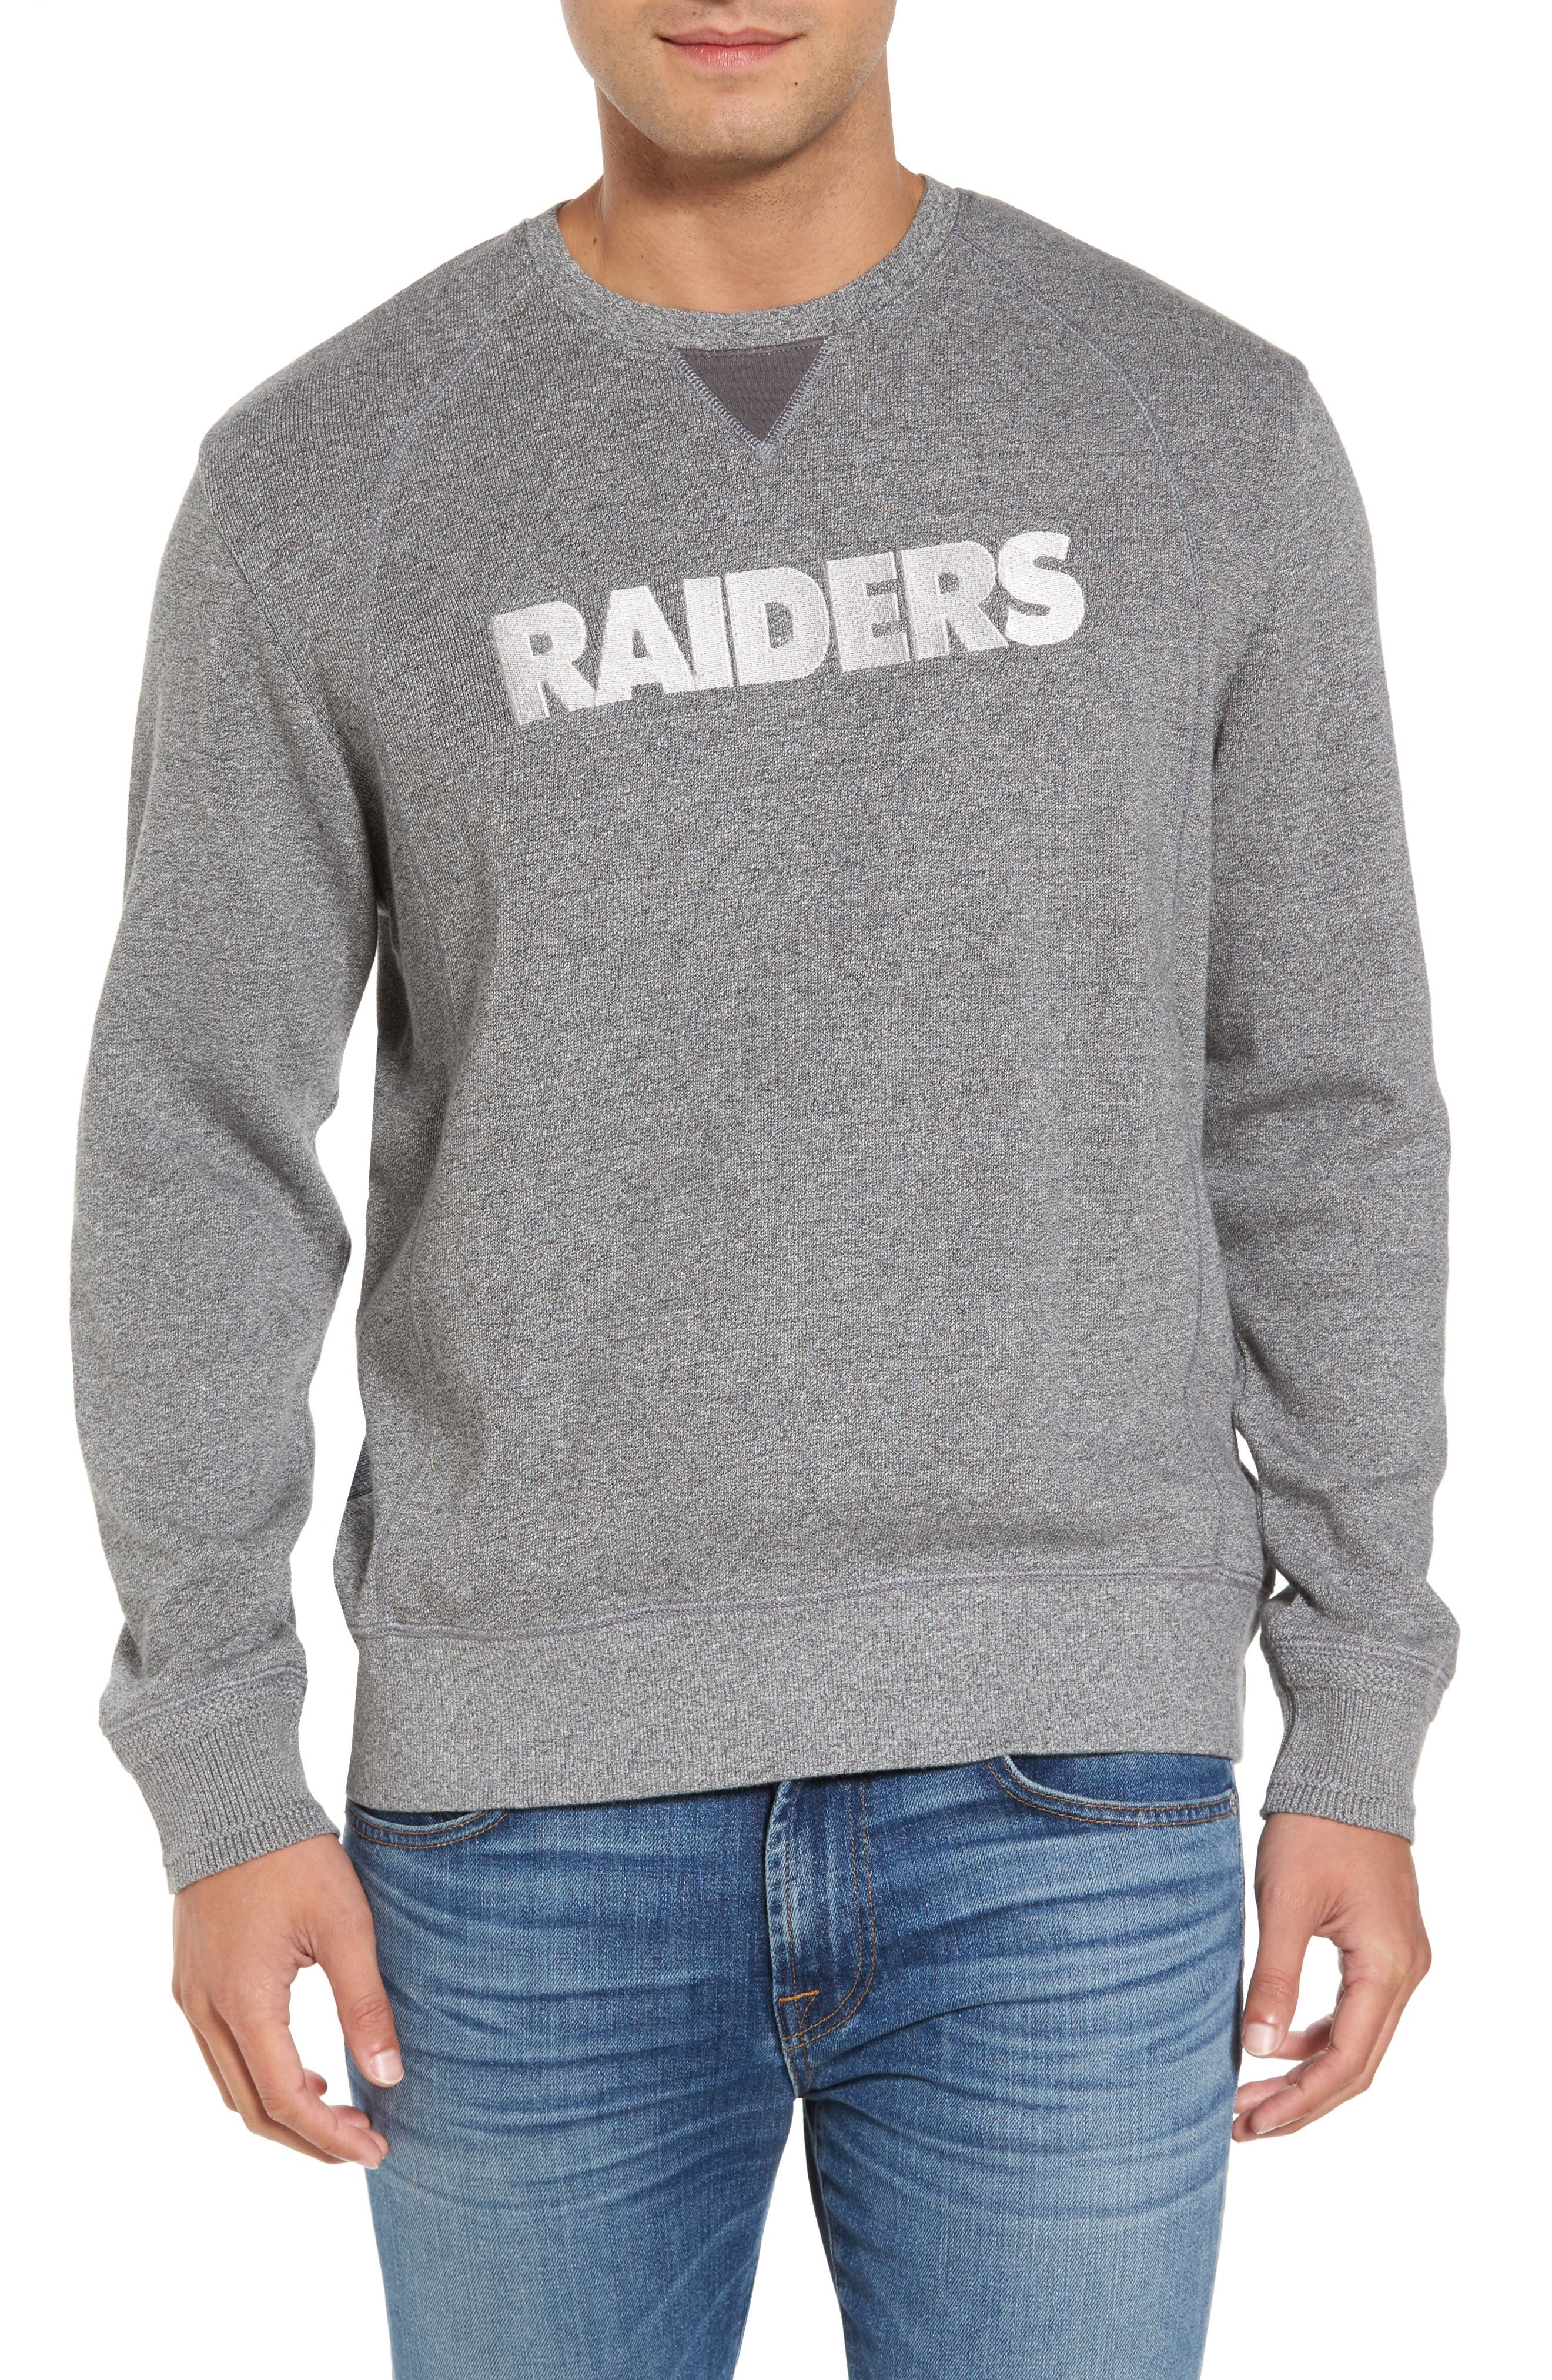 NFL Stitch of Liberty Embroidered Crewneck Sweatshirt,                             Main thumbnail 23, color,